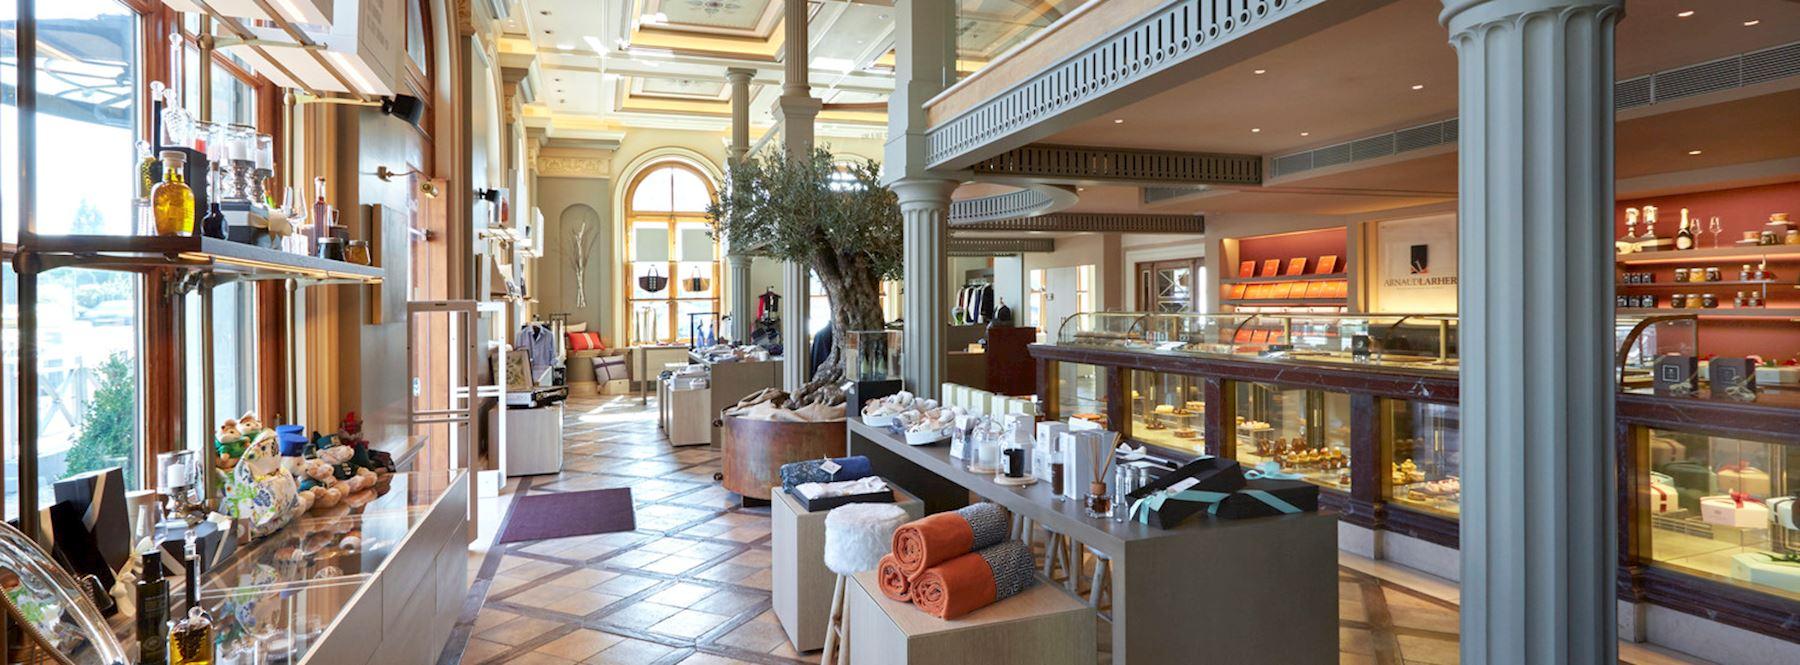 GB Corner Hotel Grande Bretagne